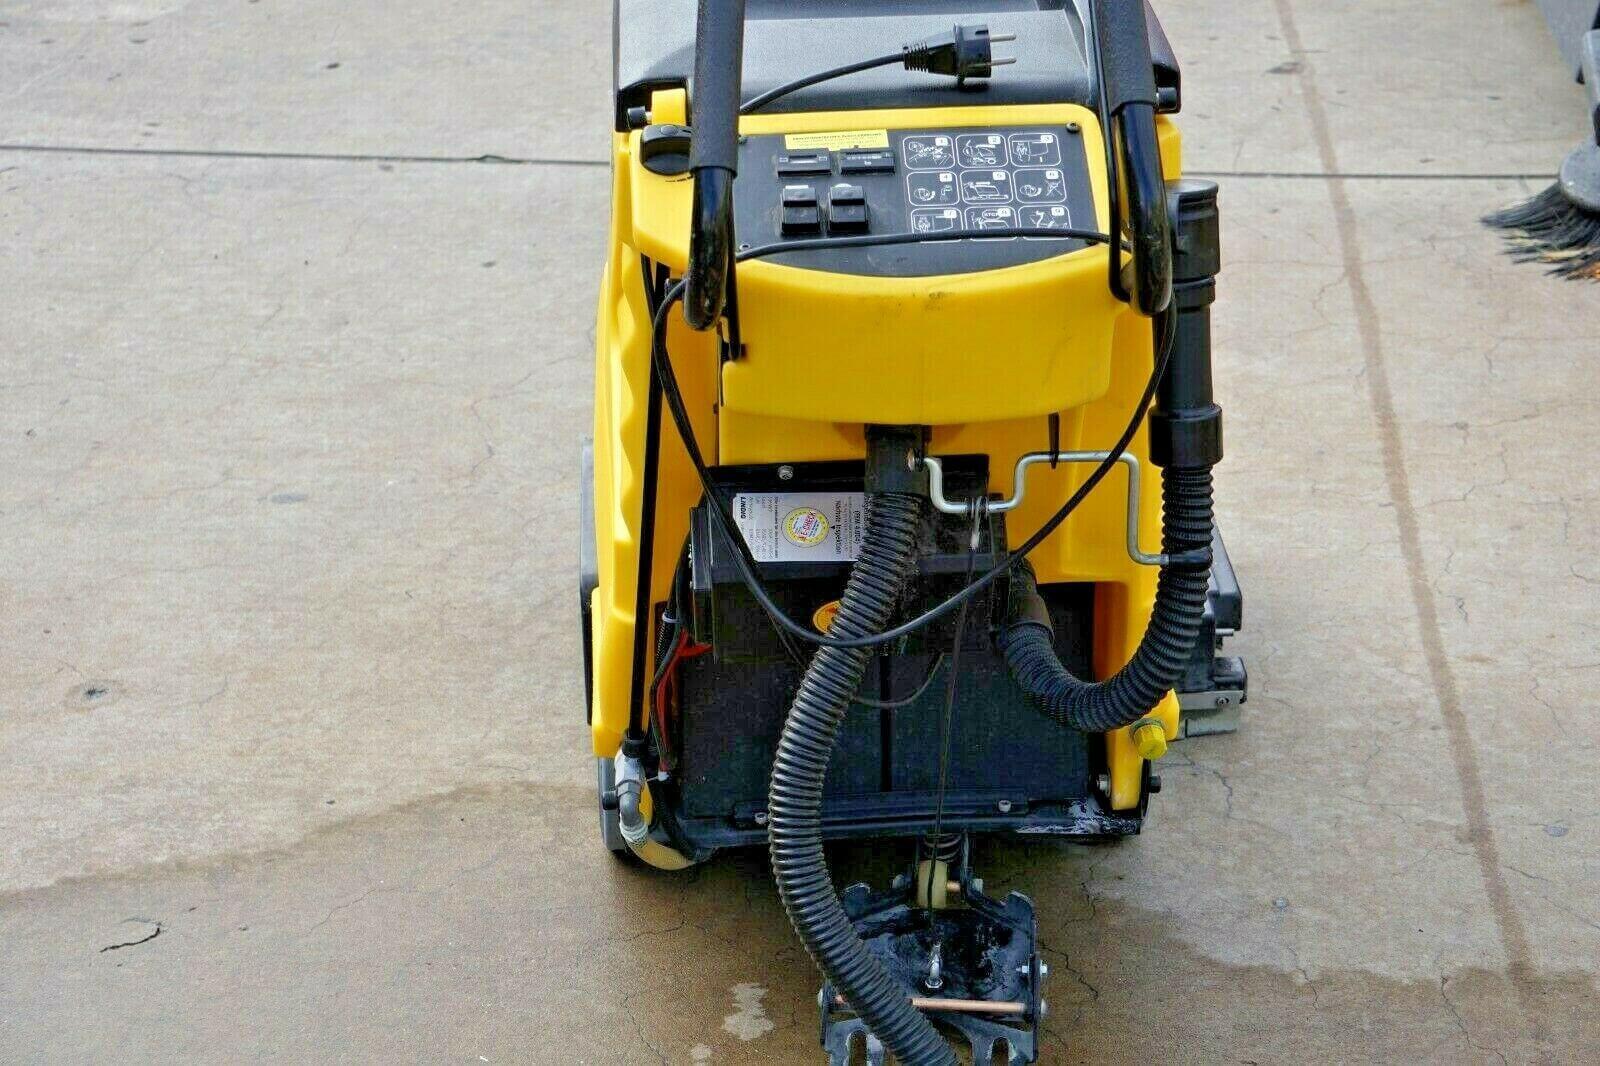 Kärcher BR 530 XL BAT 1.127-431.0